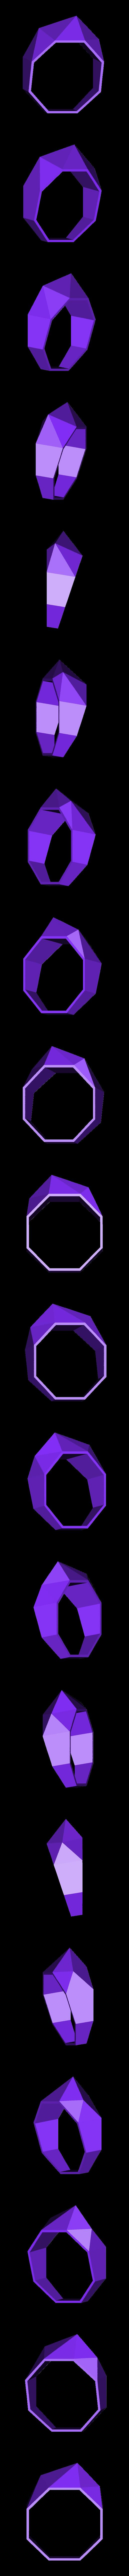 "01.stl Download free STL file the ""Bling Rings"" • 3D print model, leFabShop"